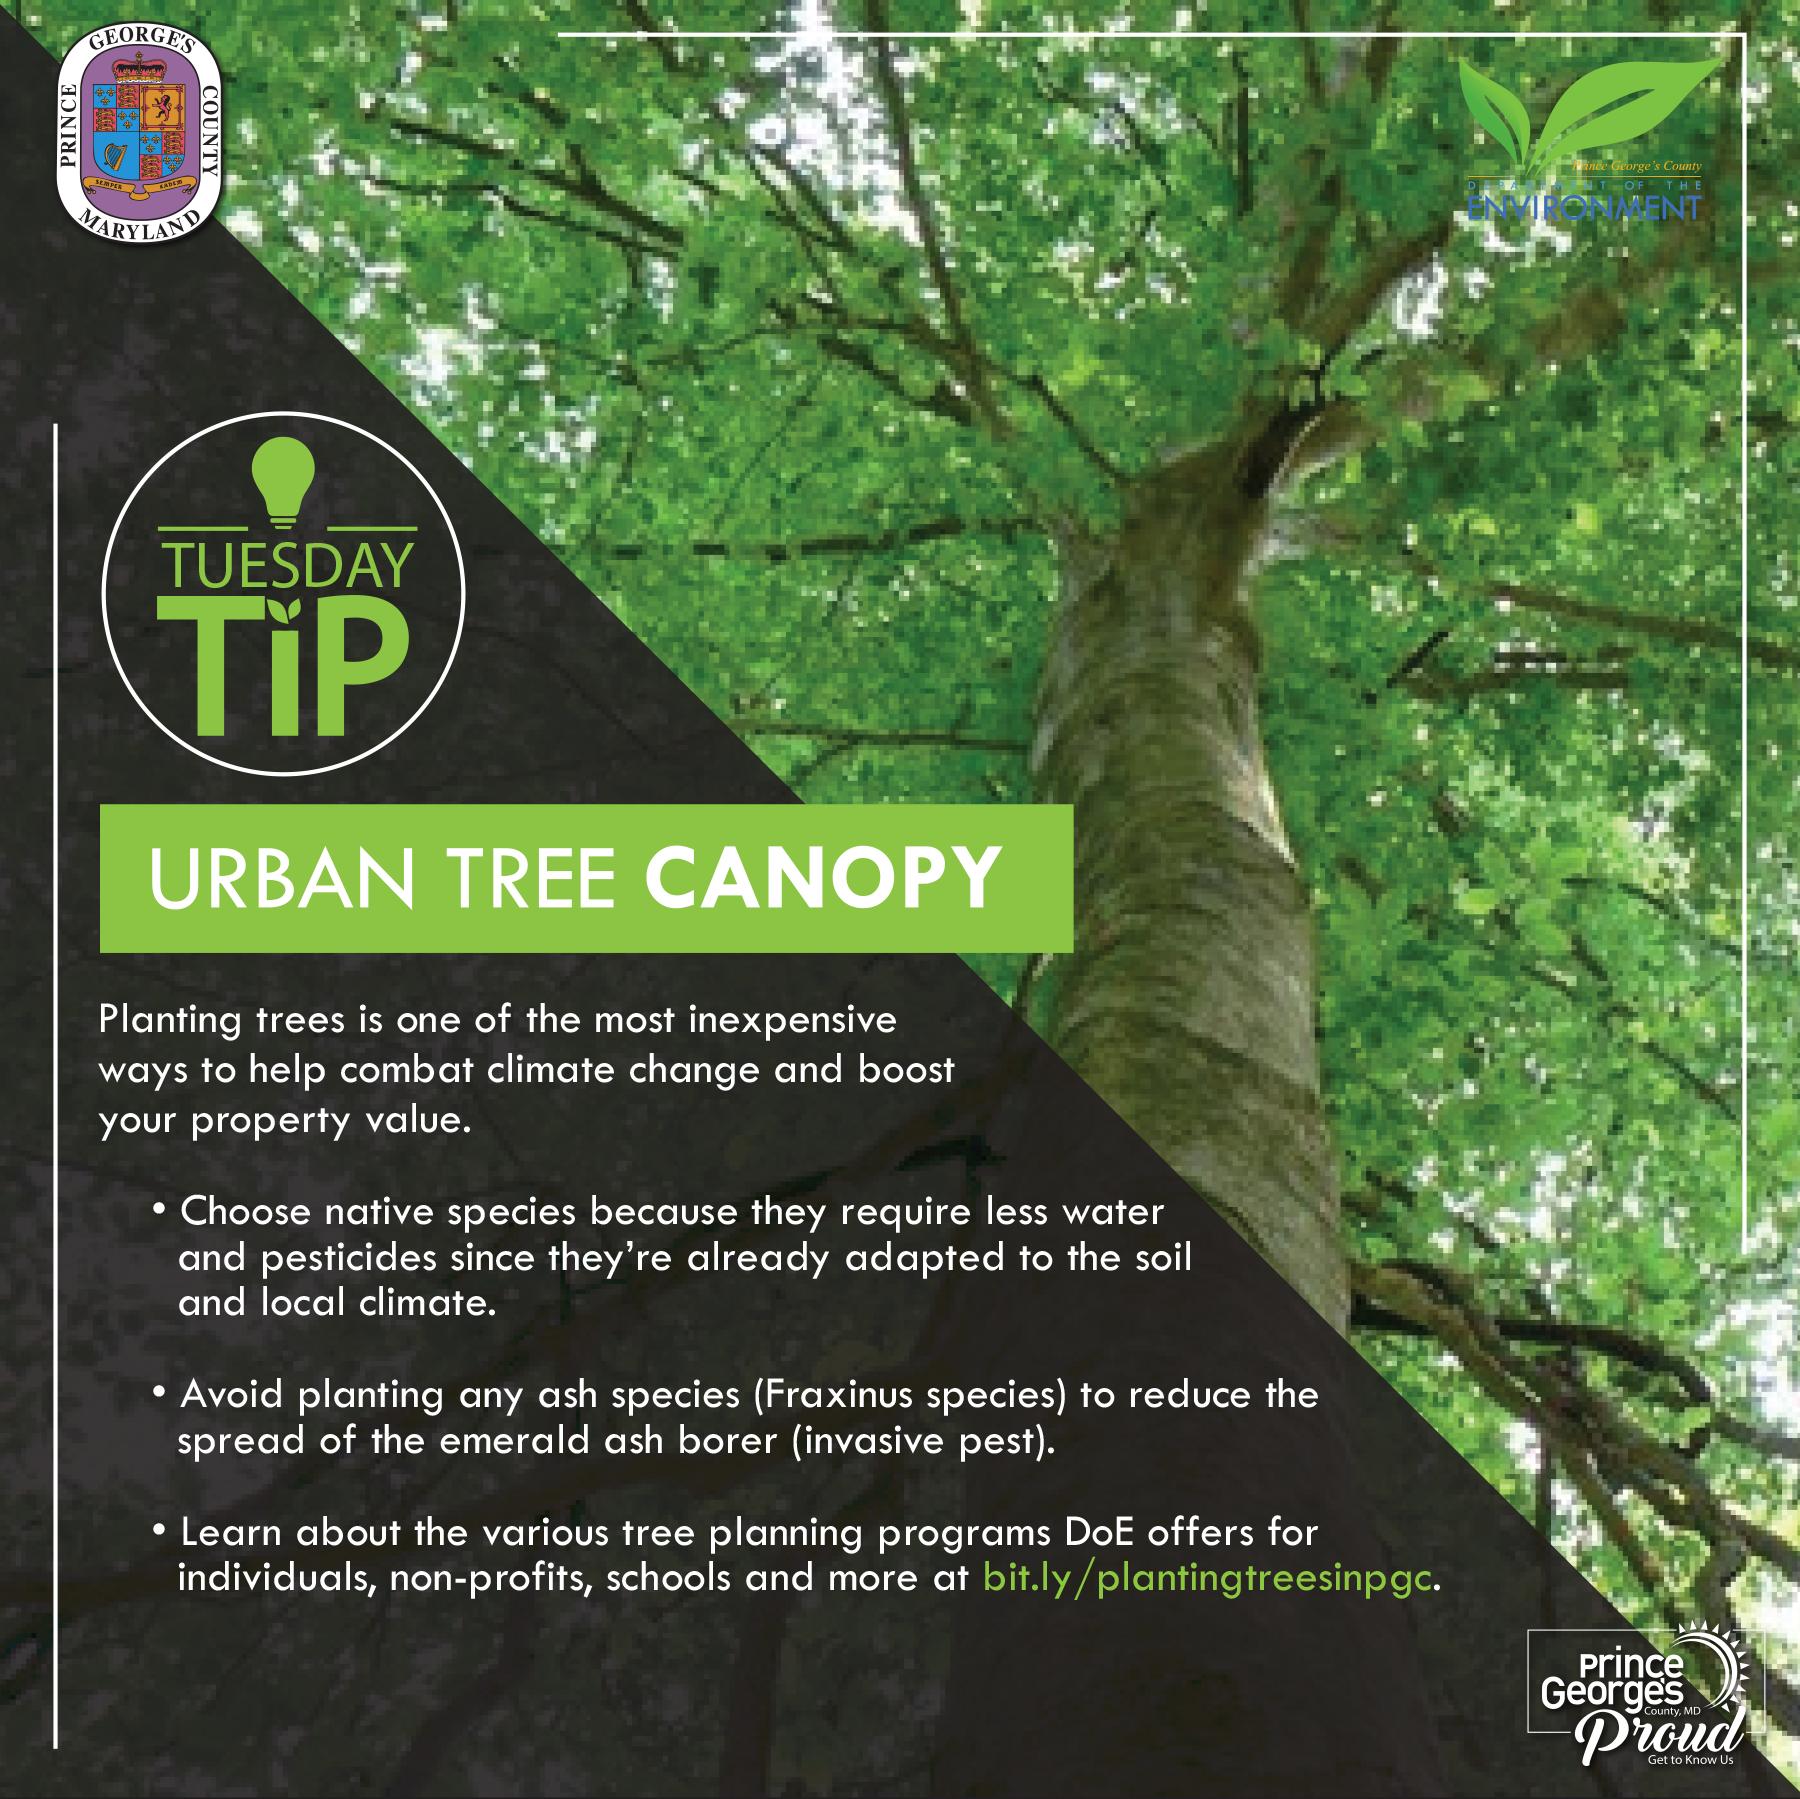 Tues Tip 4.27.21 TreeCanopy eng